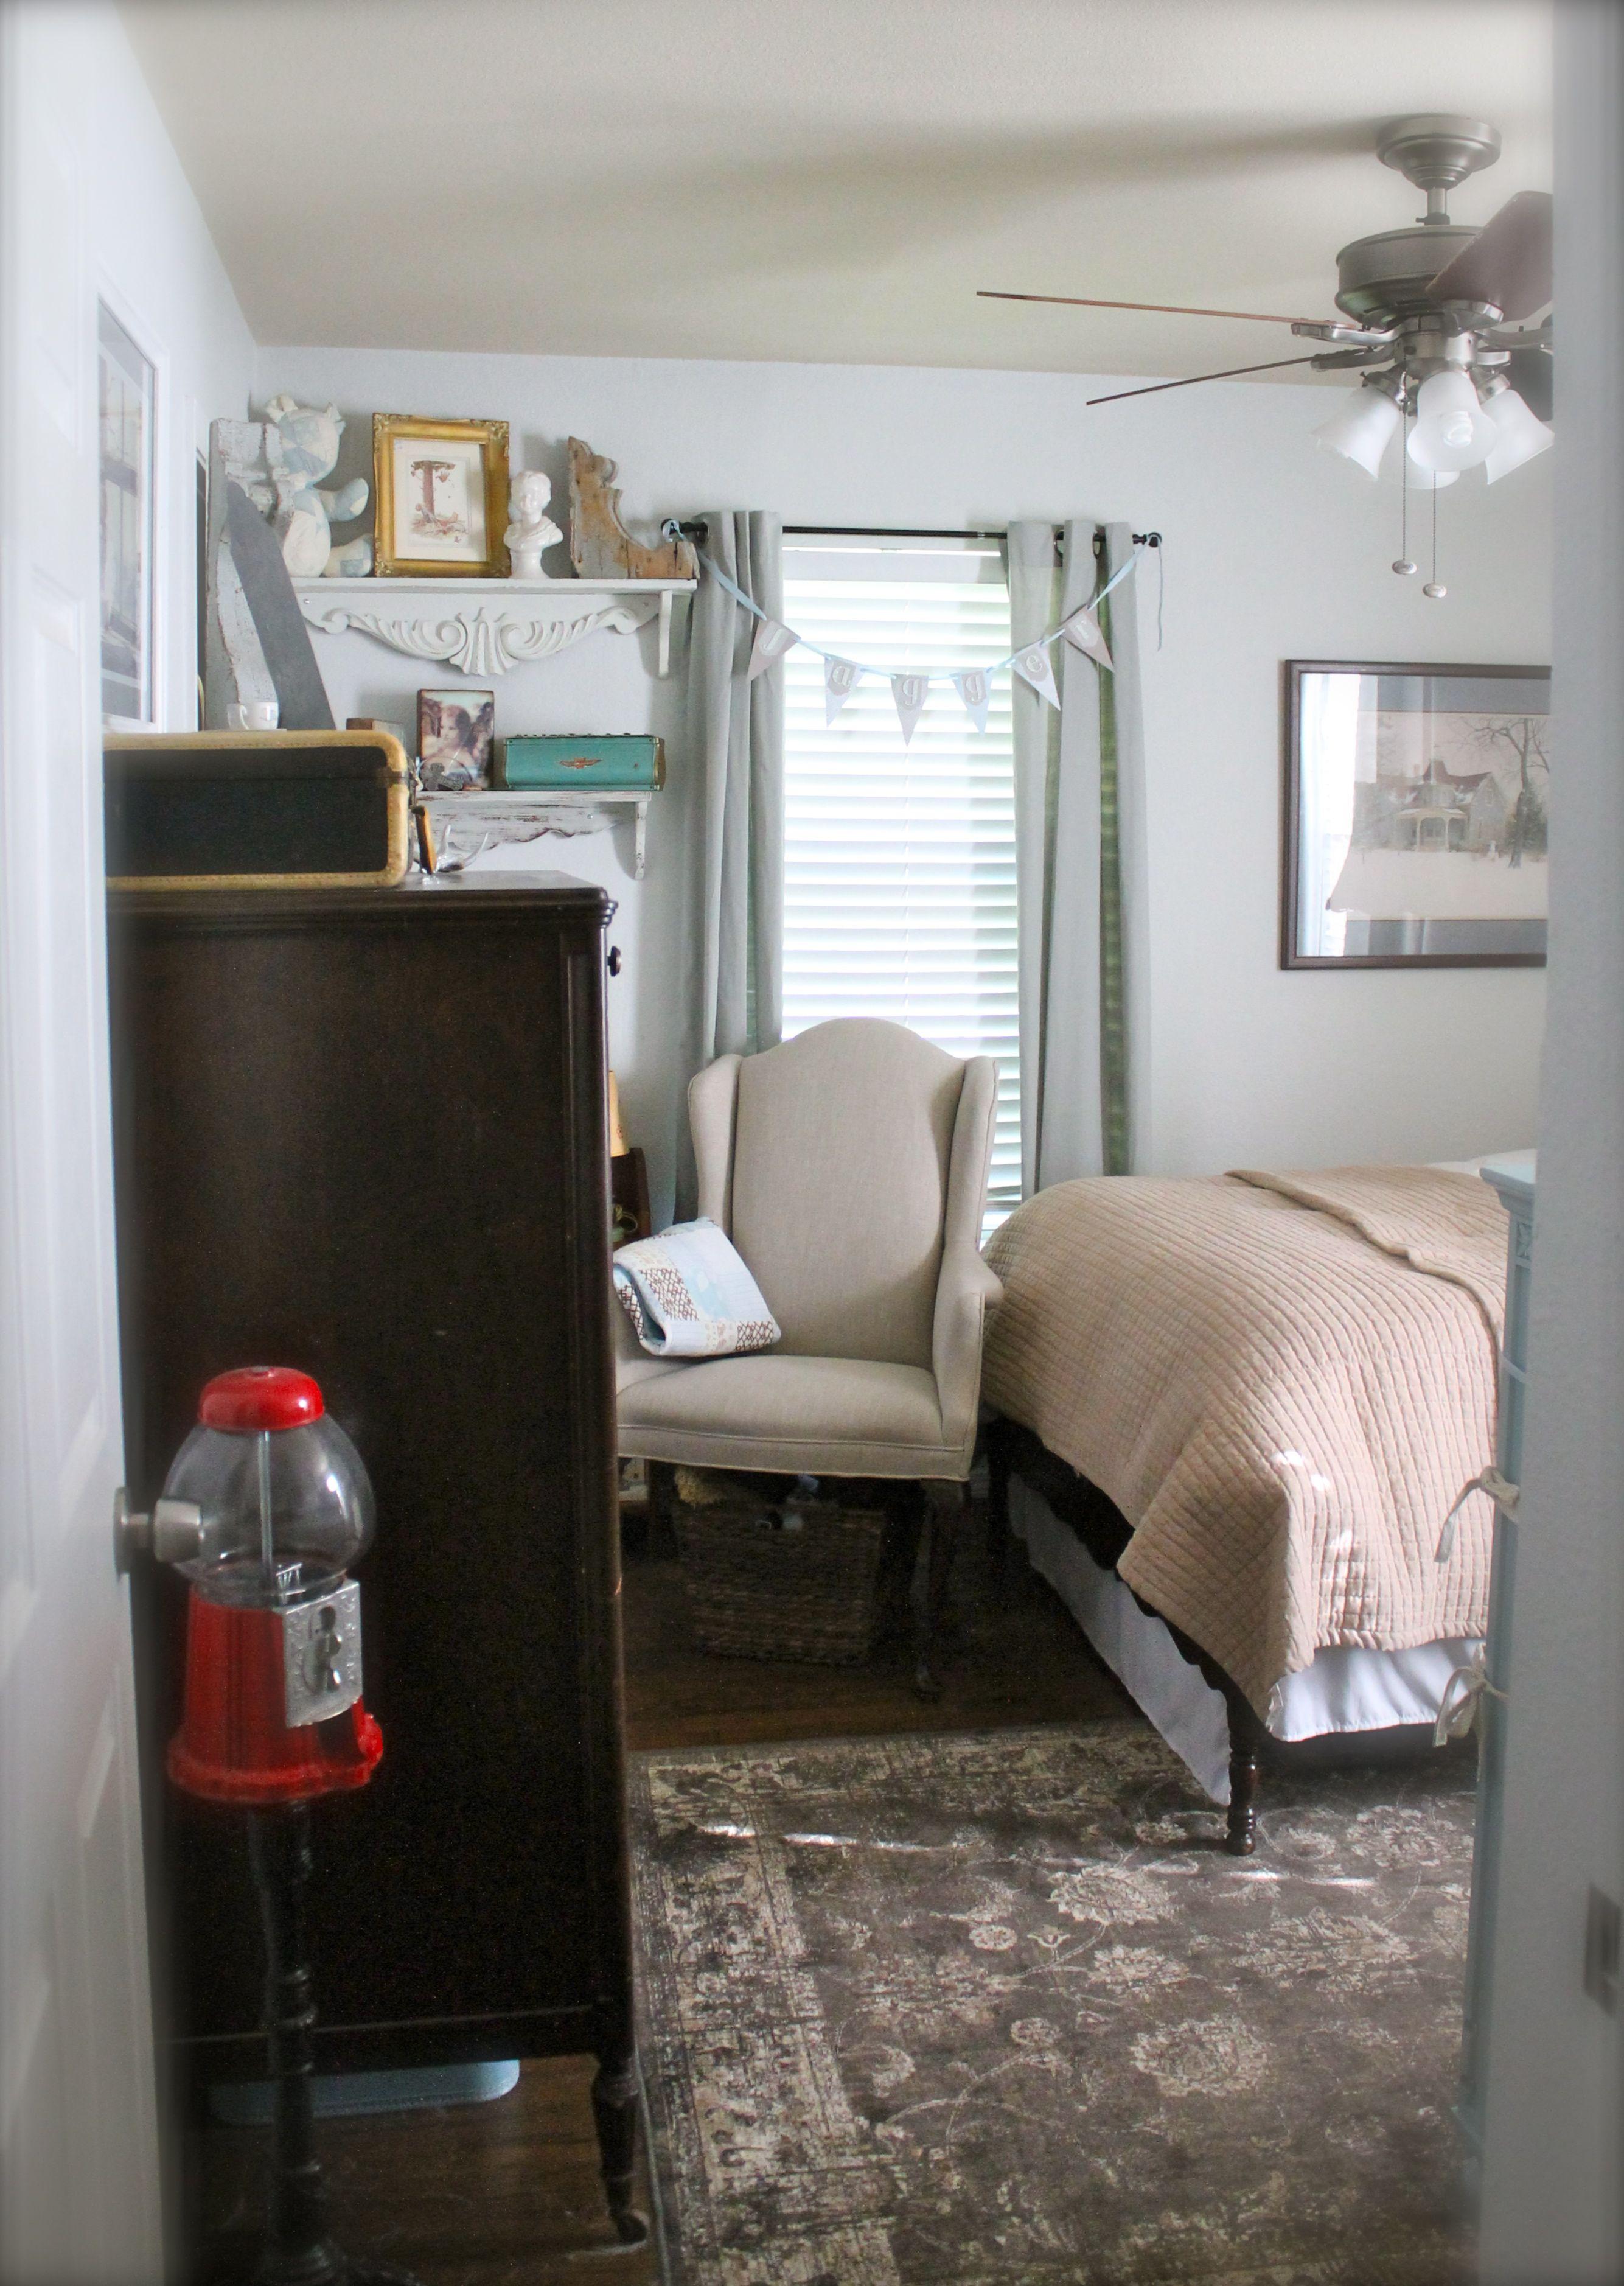 Vintage Boy Room Nursery Paint Fleur De Sel By Sherwin Williams Rug